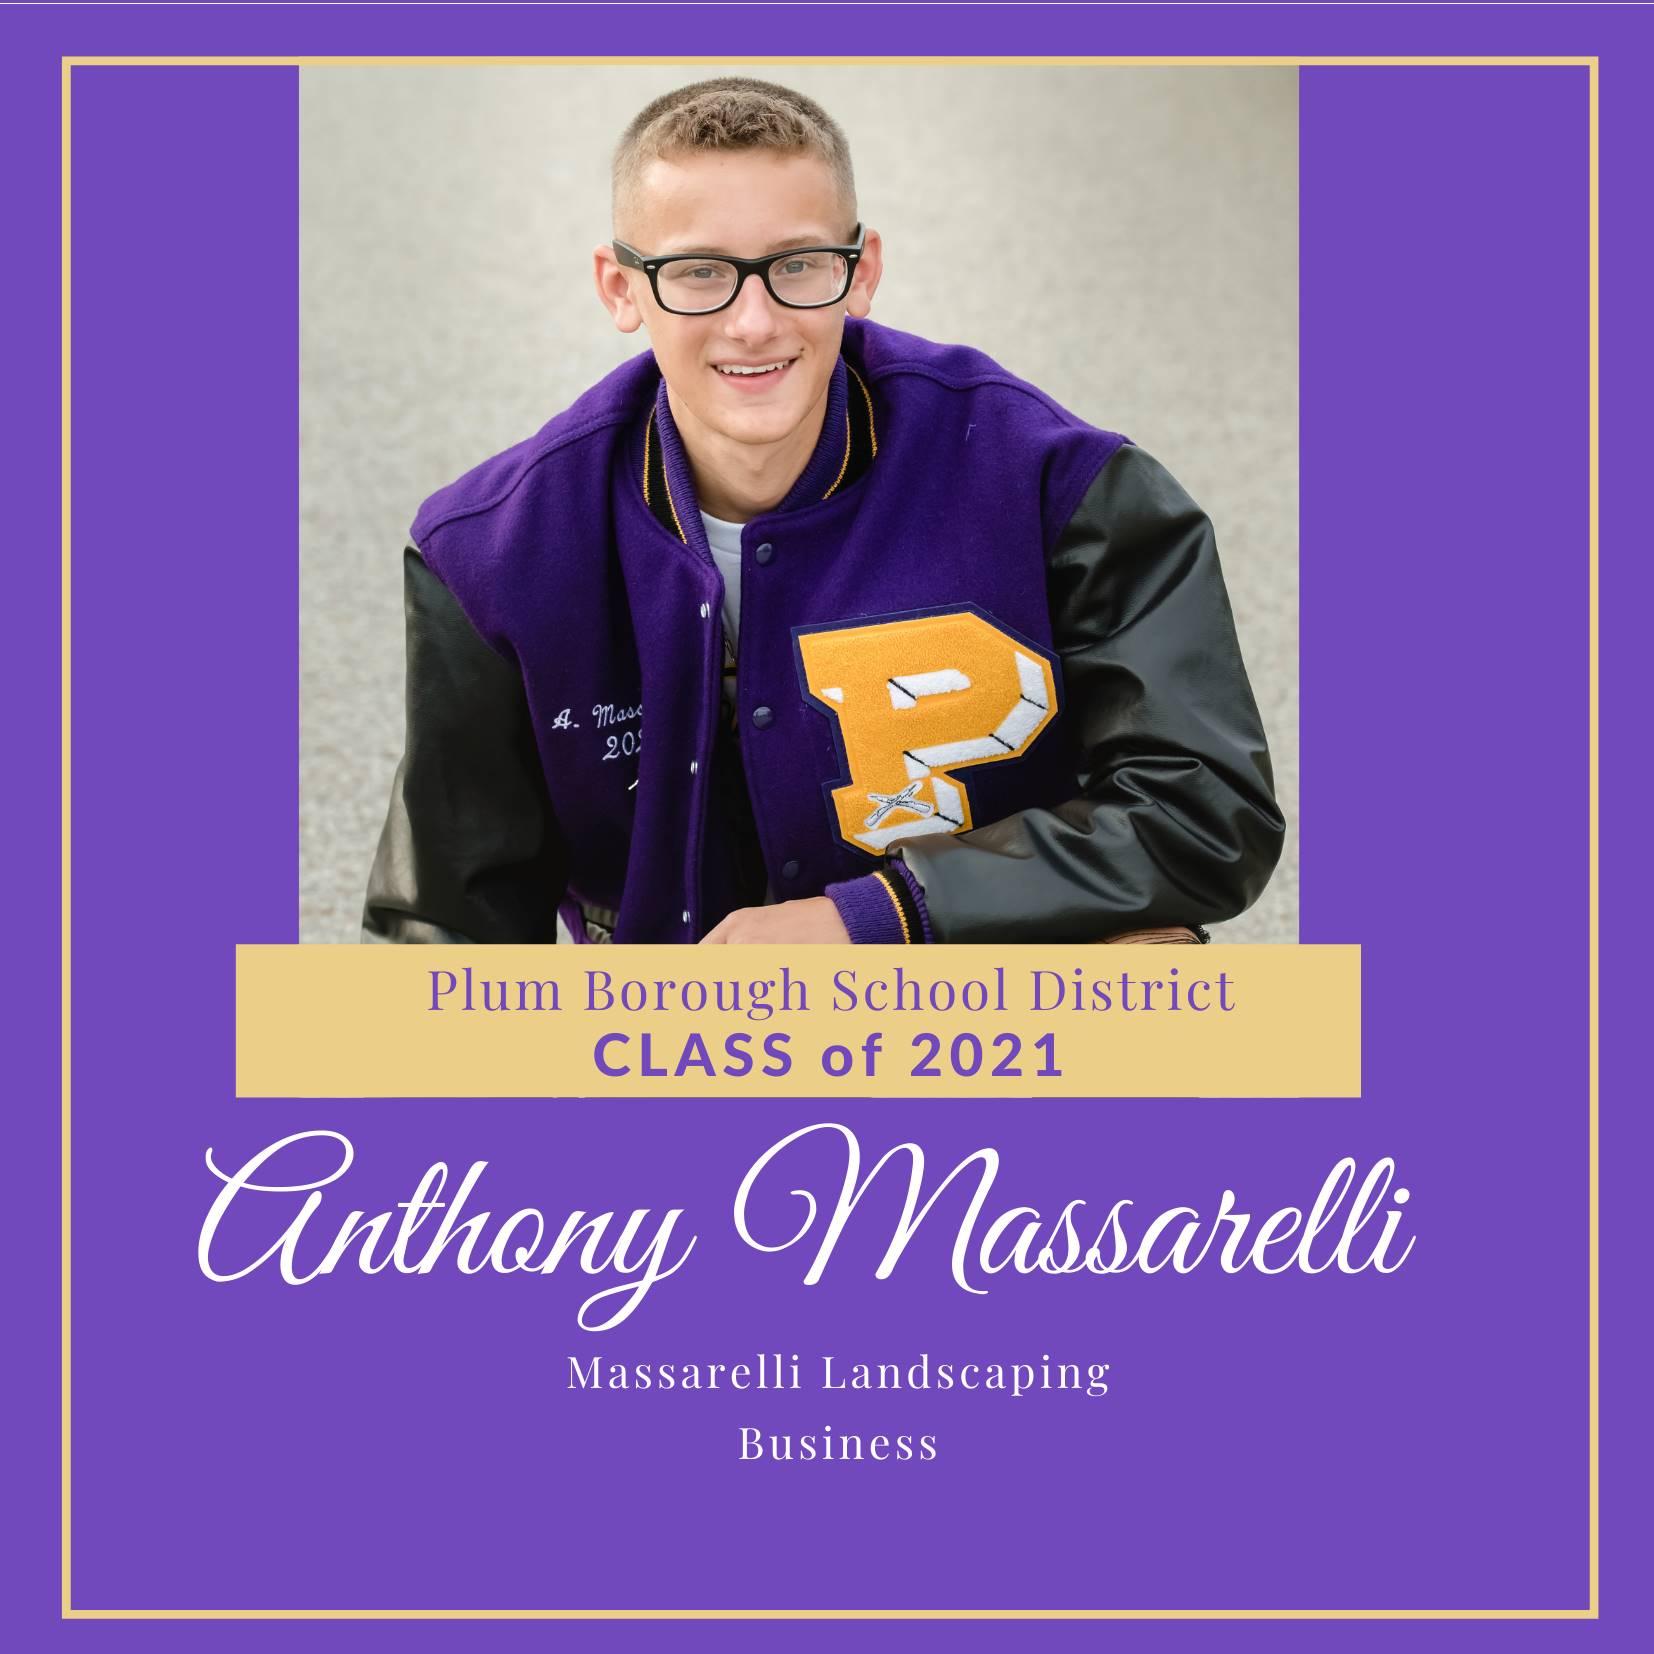 Congratulations to Anthony Massarelli, Class of 2021!